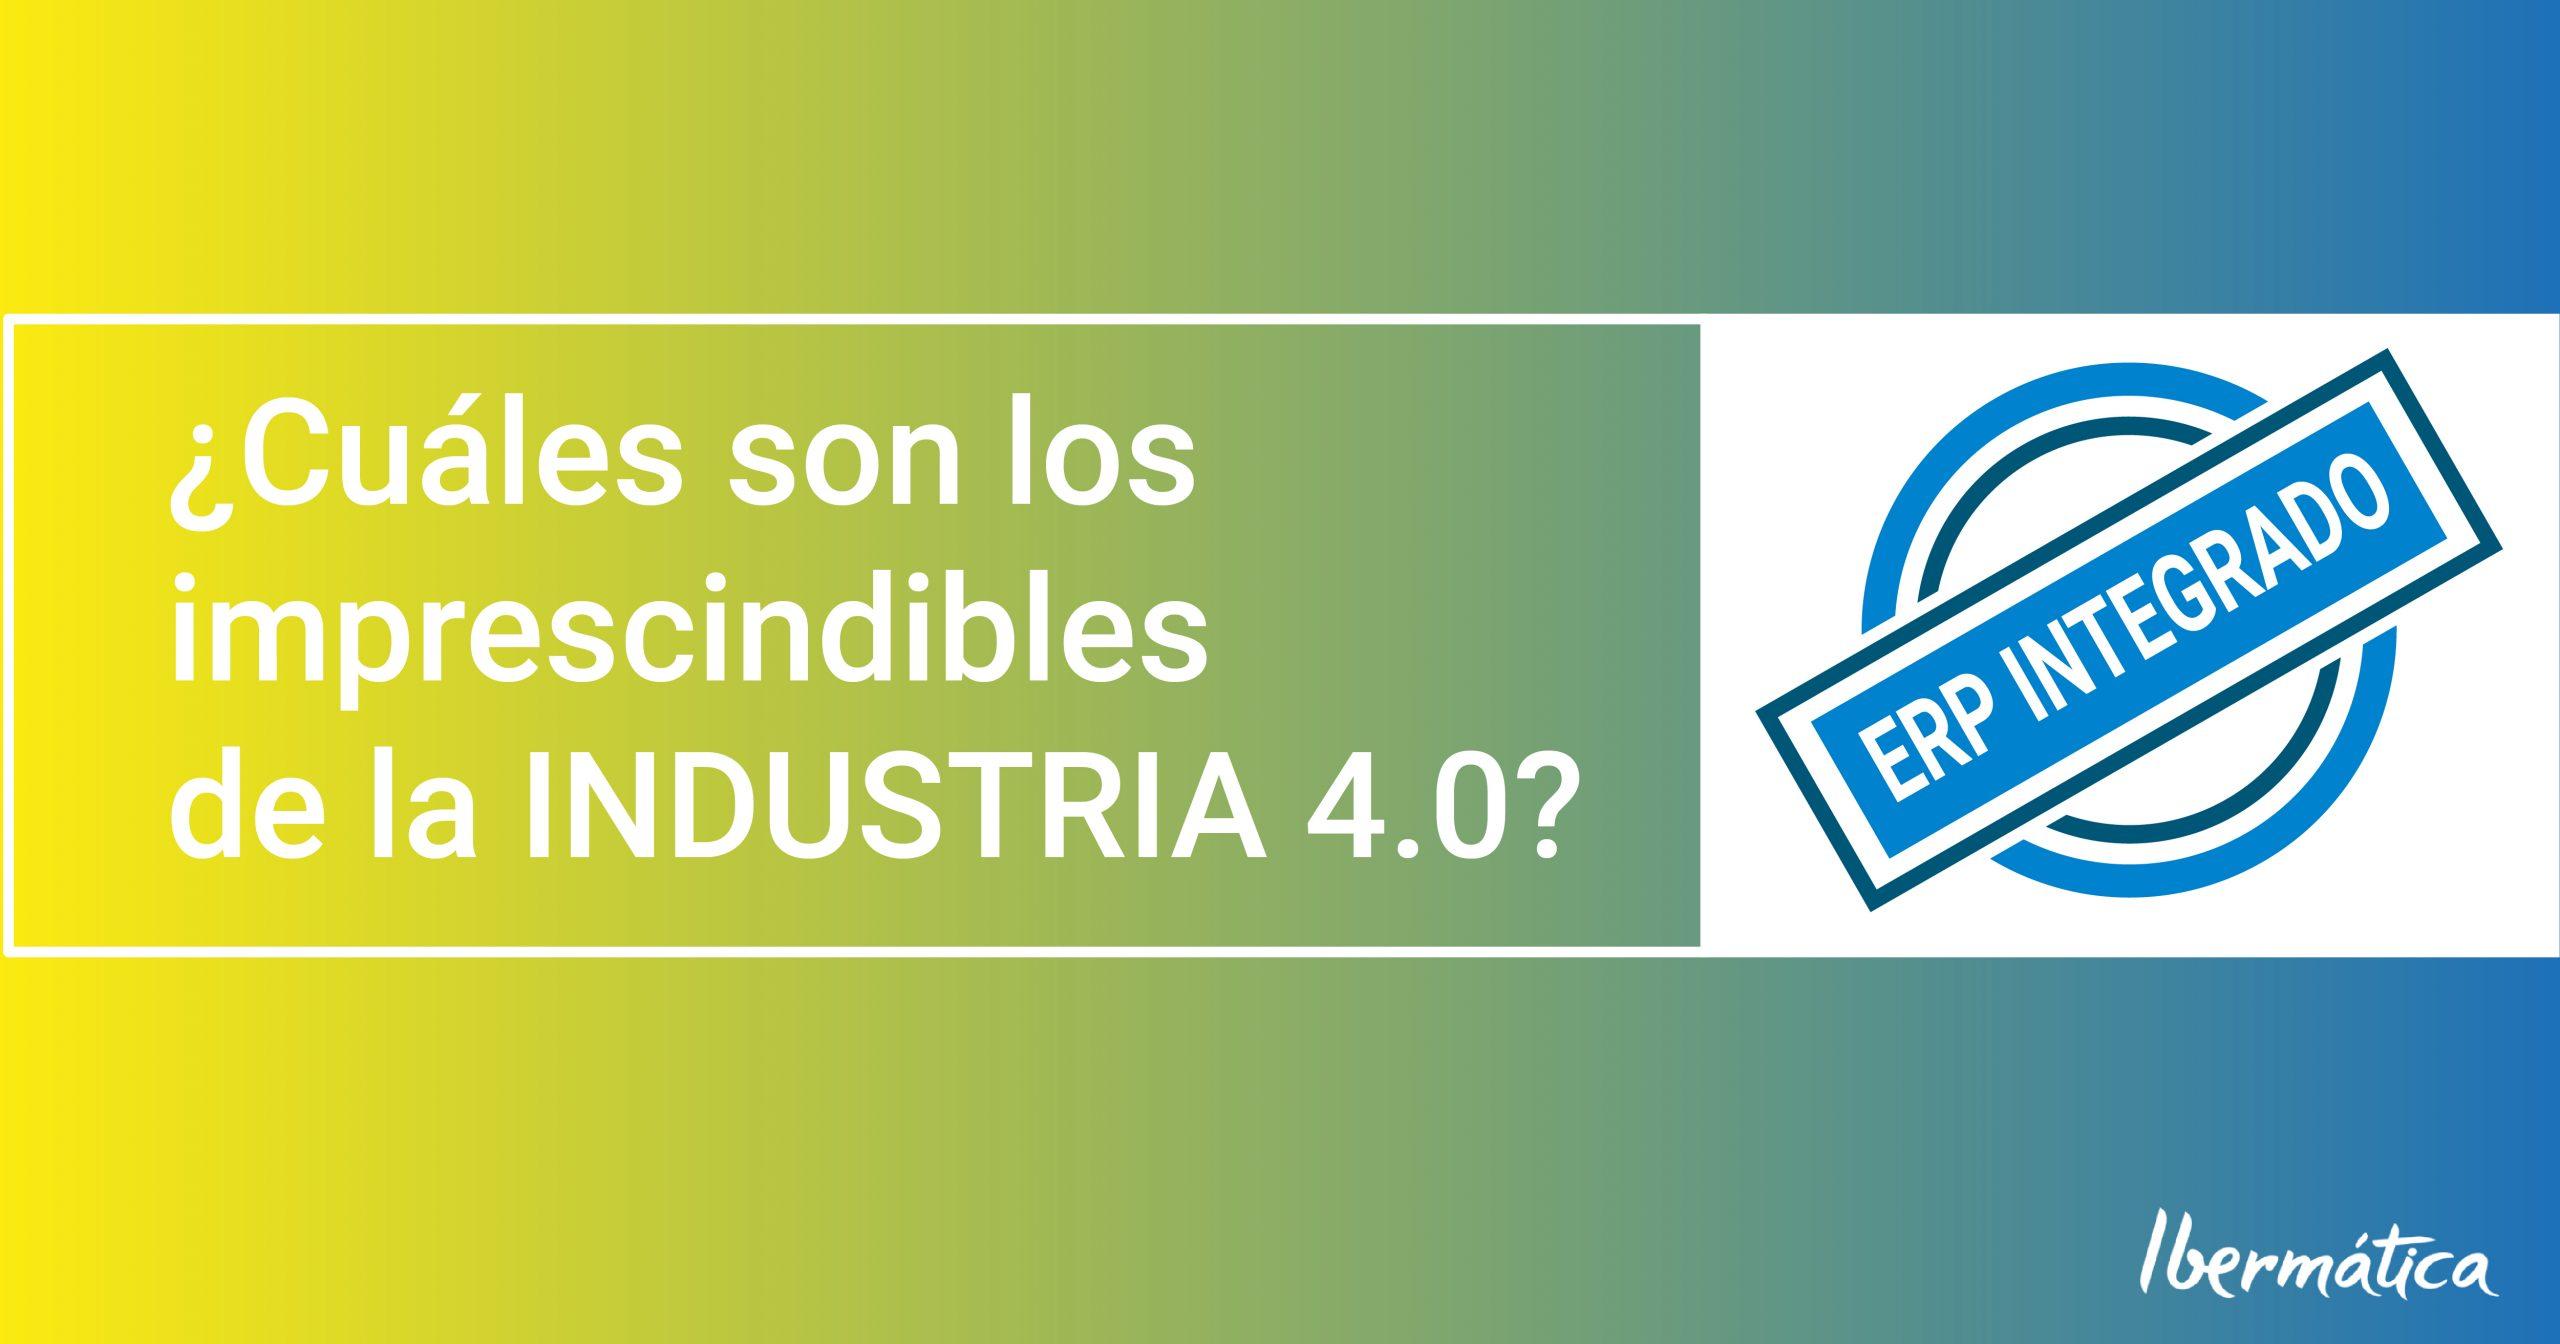 Aplicaciones industria 4.0